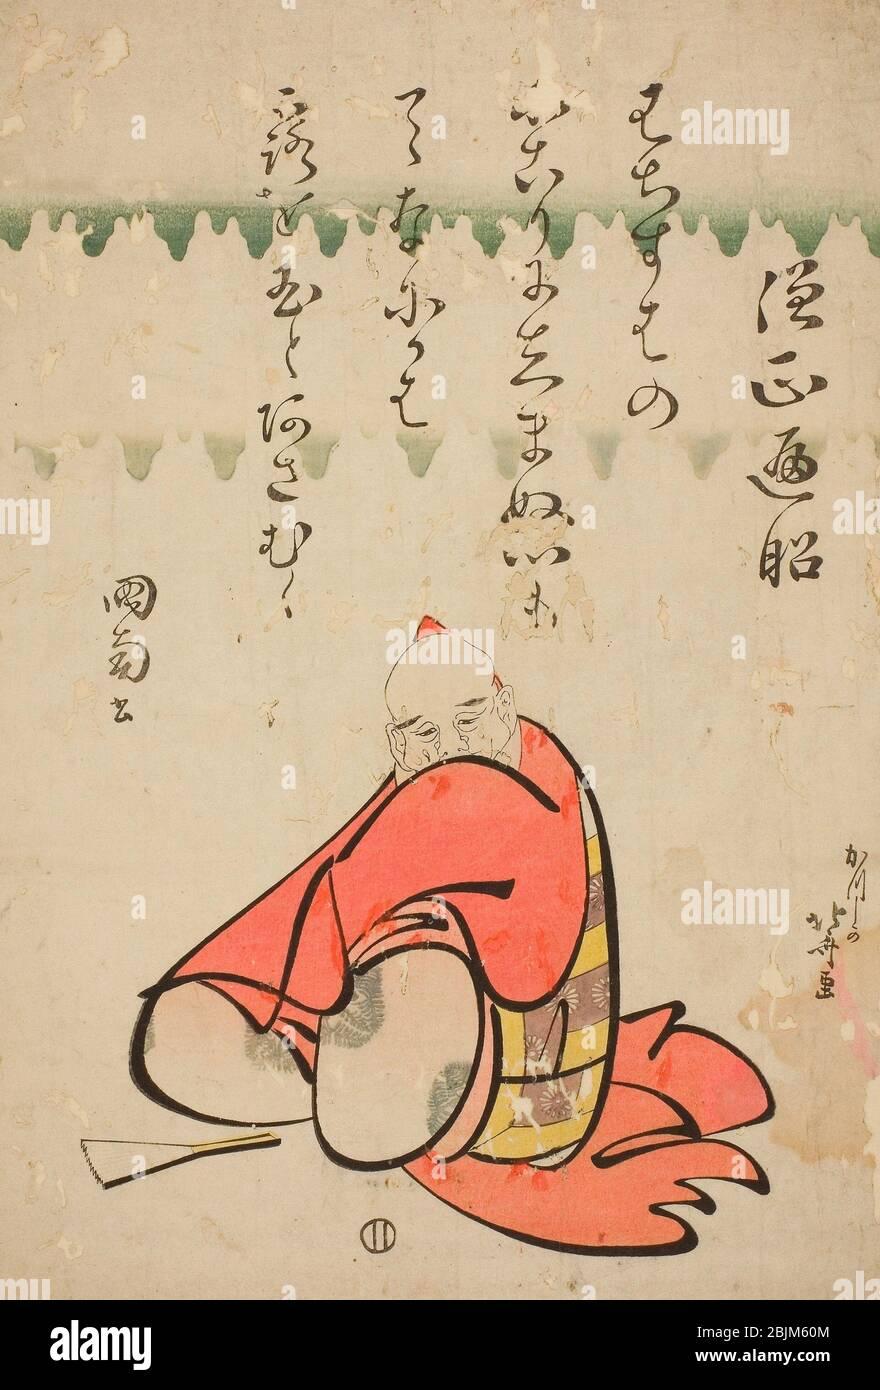 Autore: Katsushika Hokusai. Il poeta Sojo Henjo, dalla serie sei Poeti immortali (Rokkasen) - c. 1810 - Katsushika Hokusai '> o--Z giapponese, Foto Stock